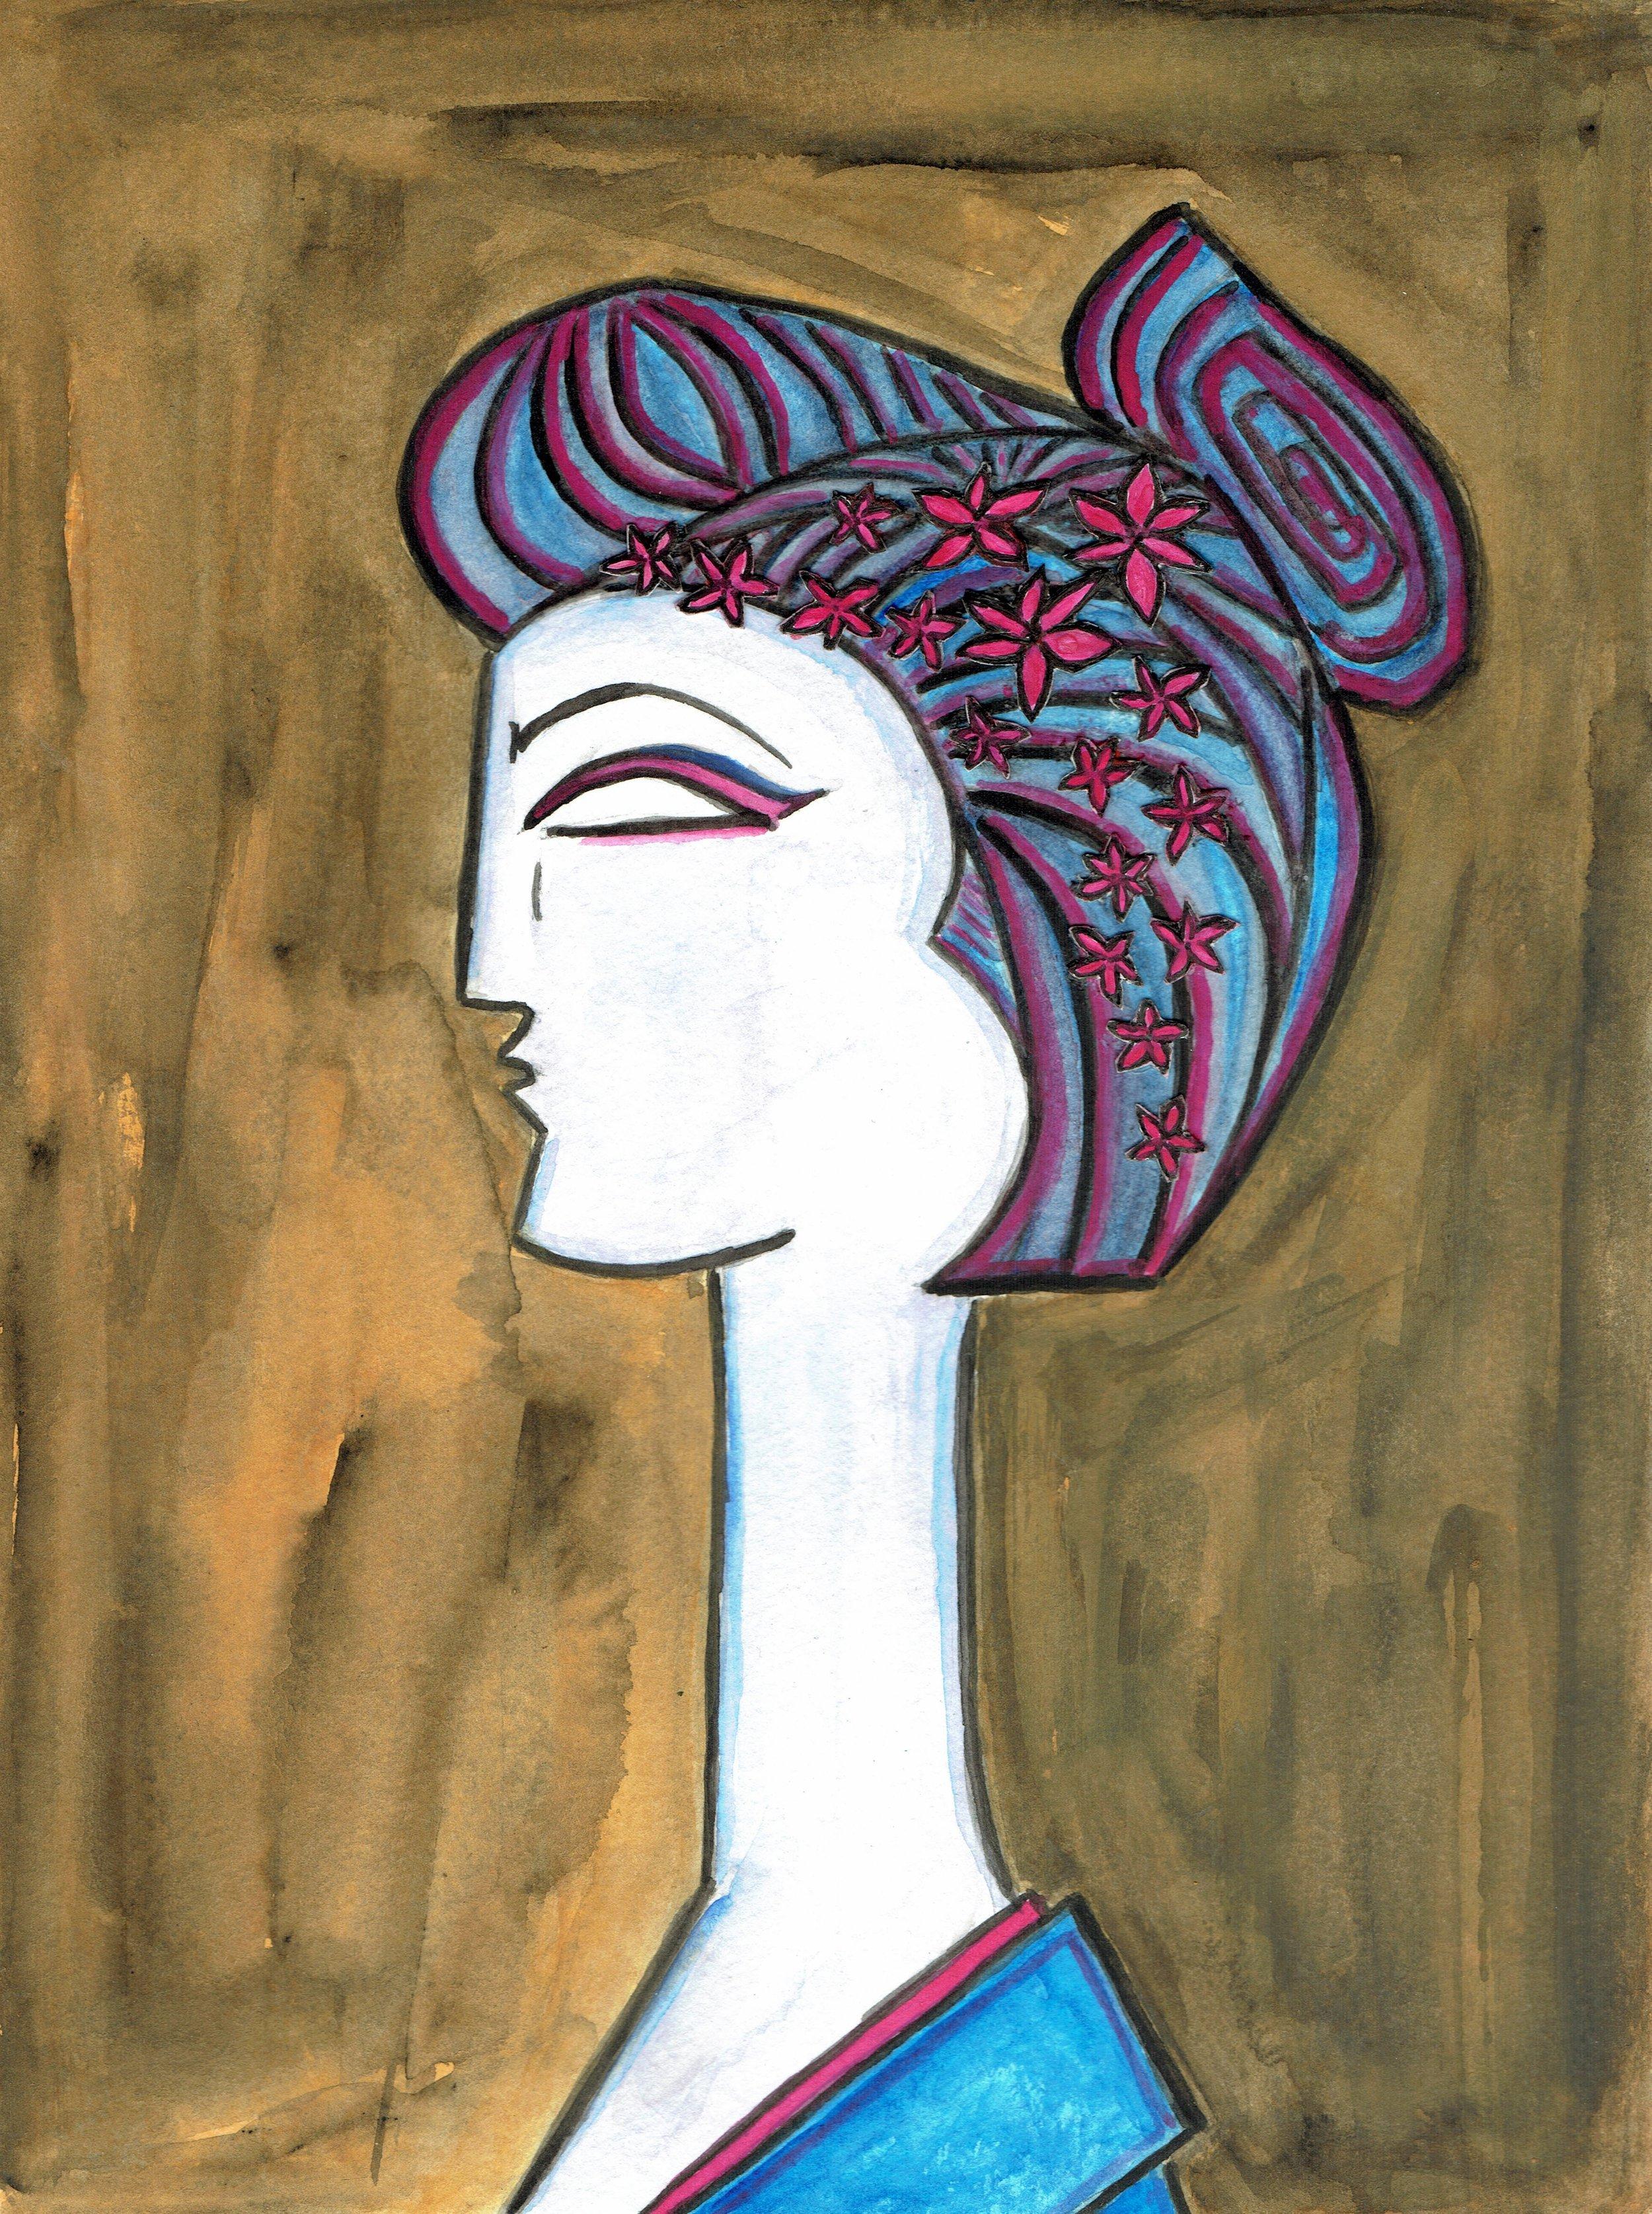 Maiko-Profile-Painting-Zepeda.jpg